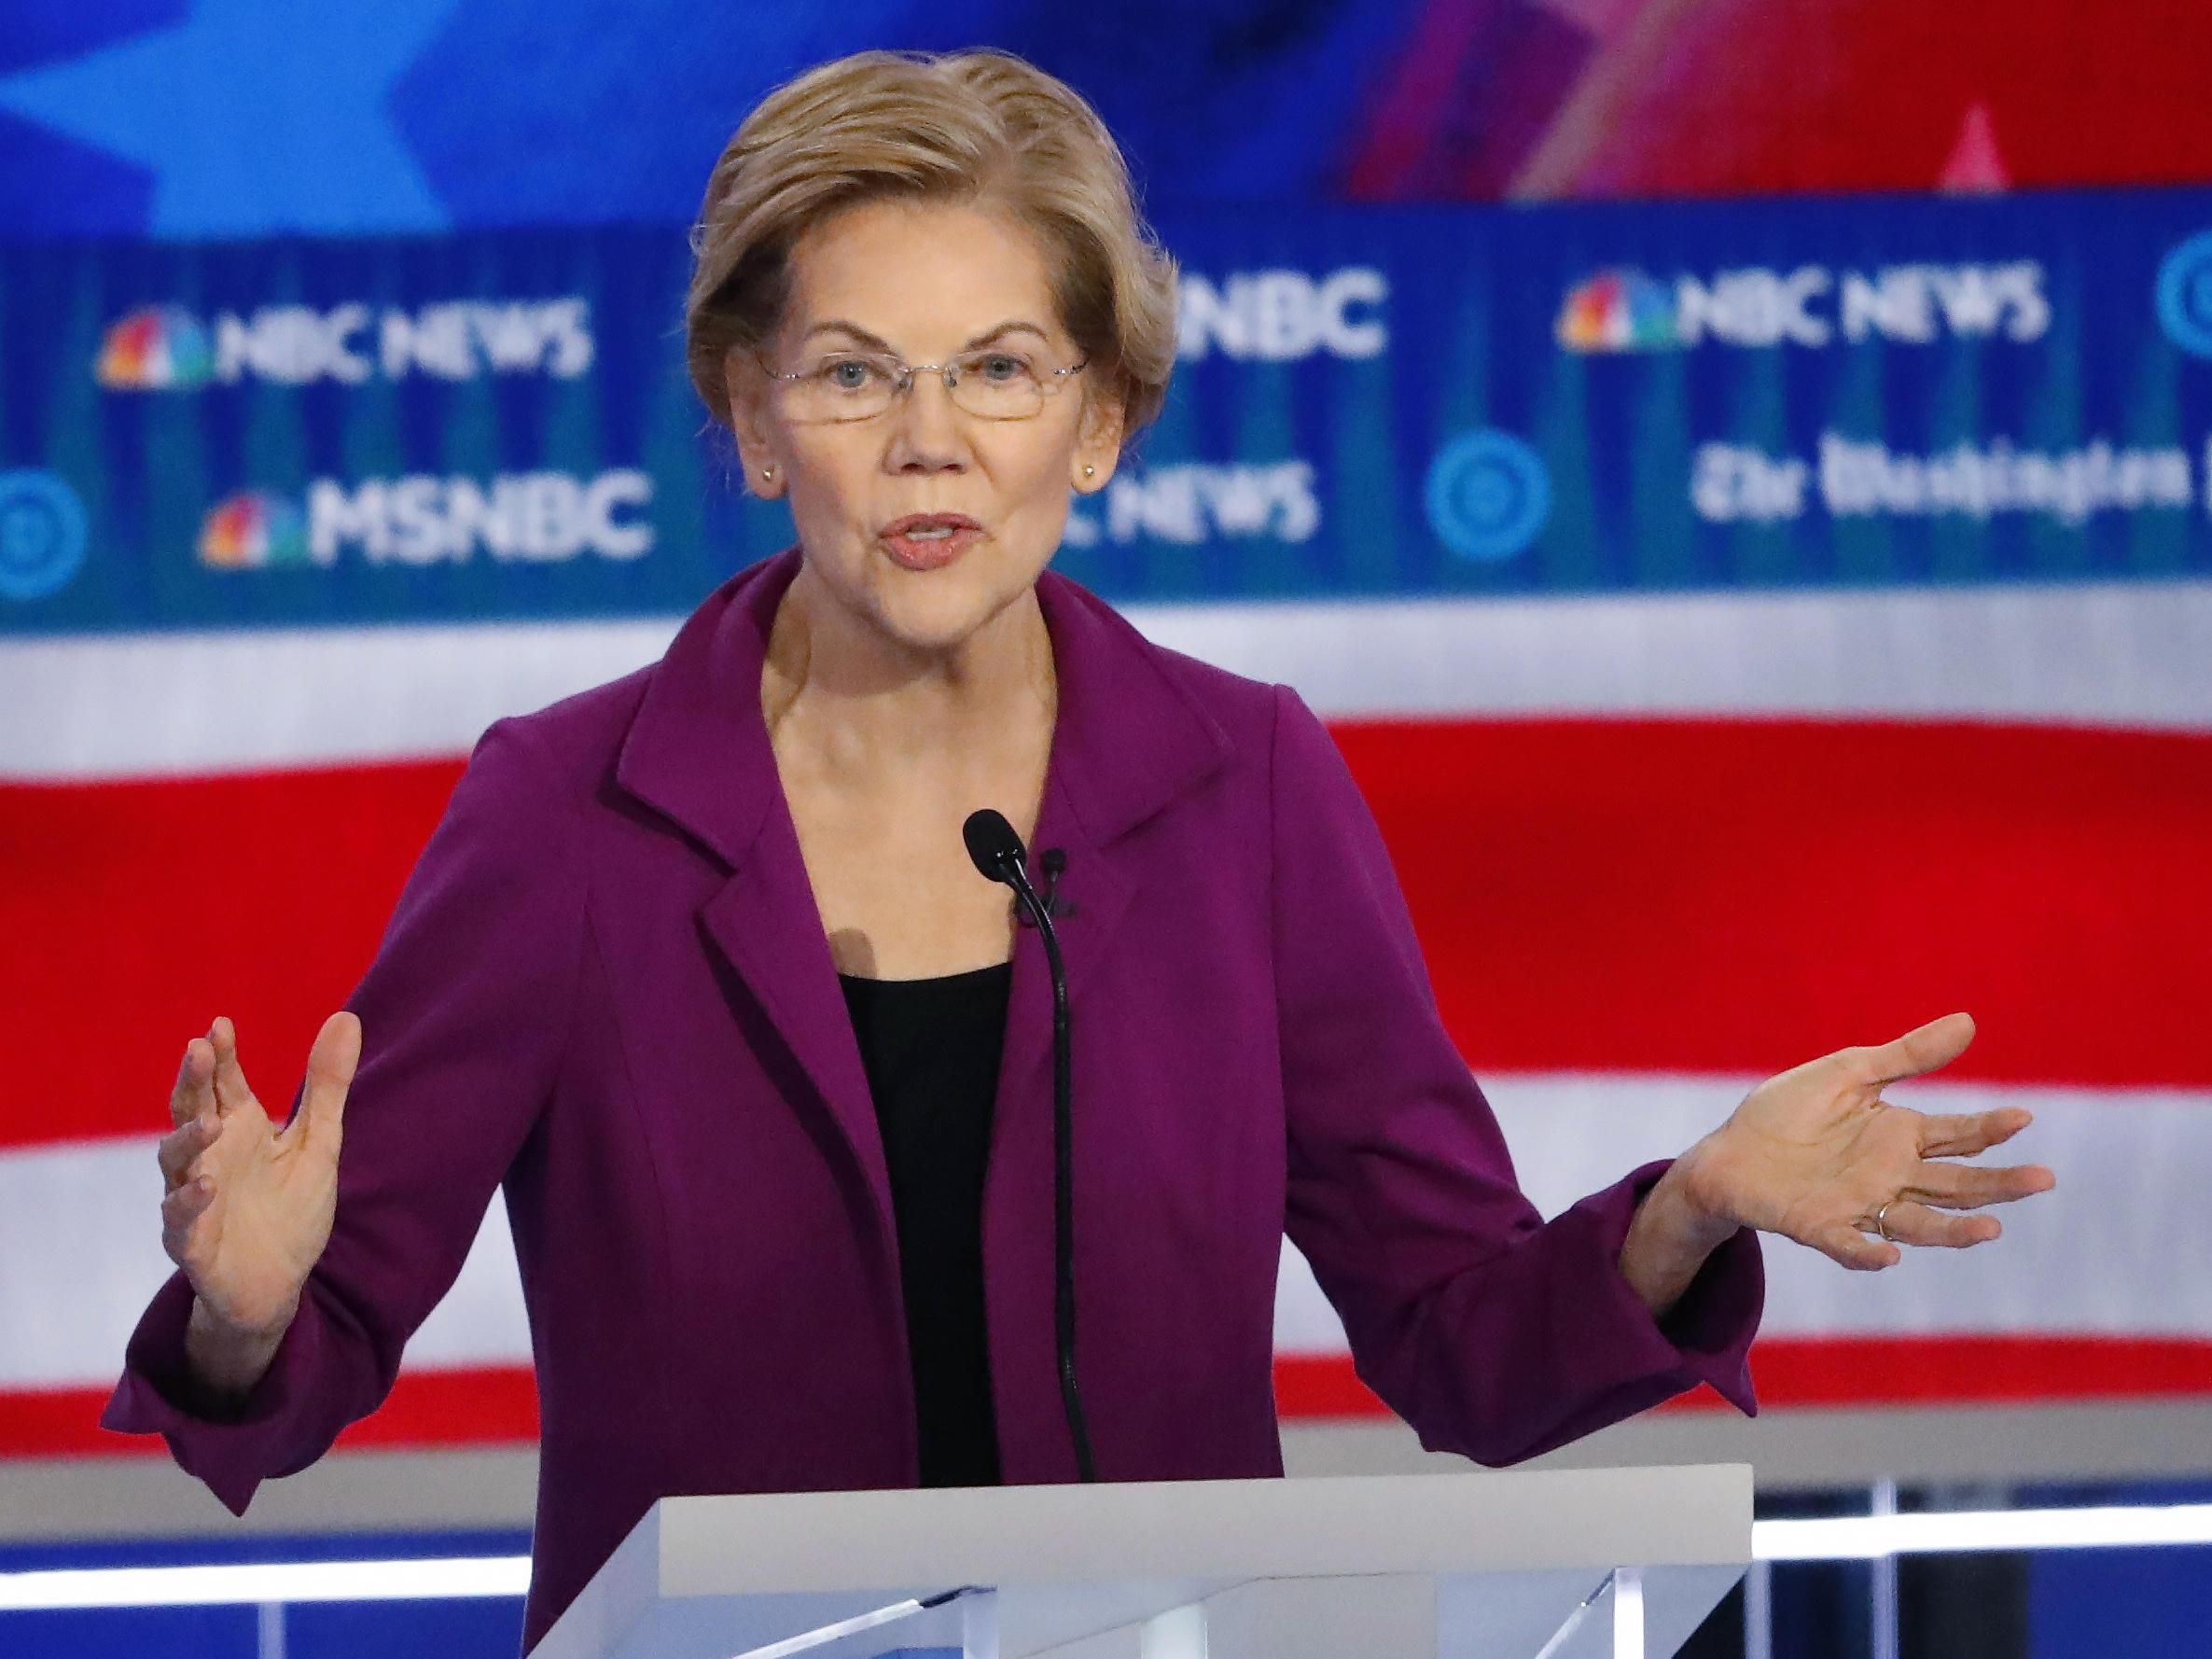 Top 2020 Candidates Threaten To Skip Upcoming Democratic Debate Amid Labor Dispute